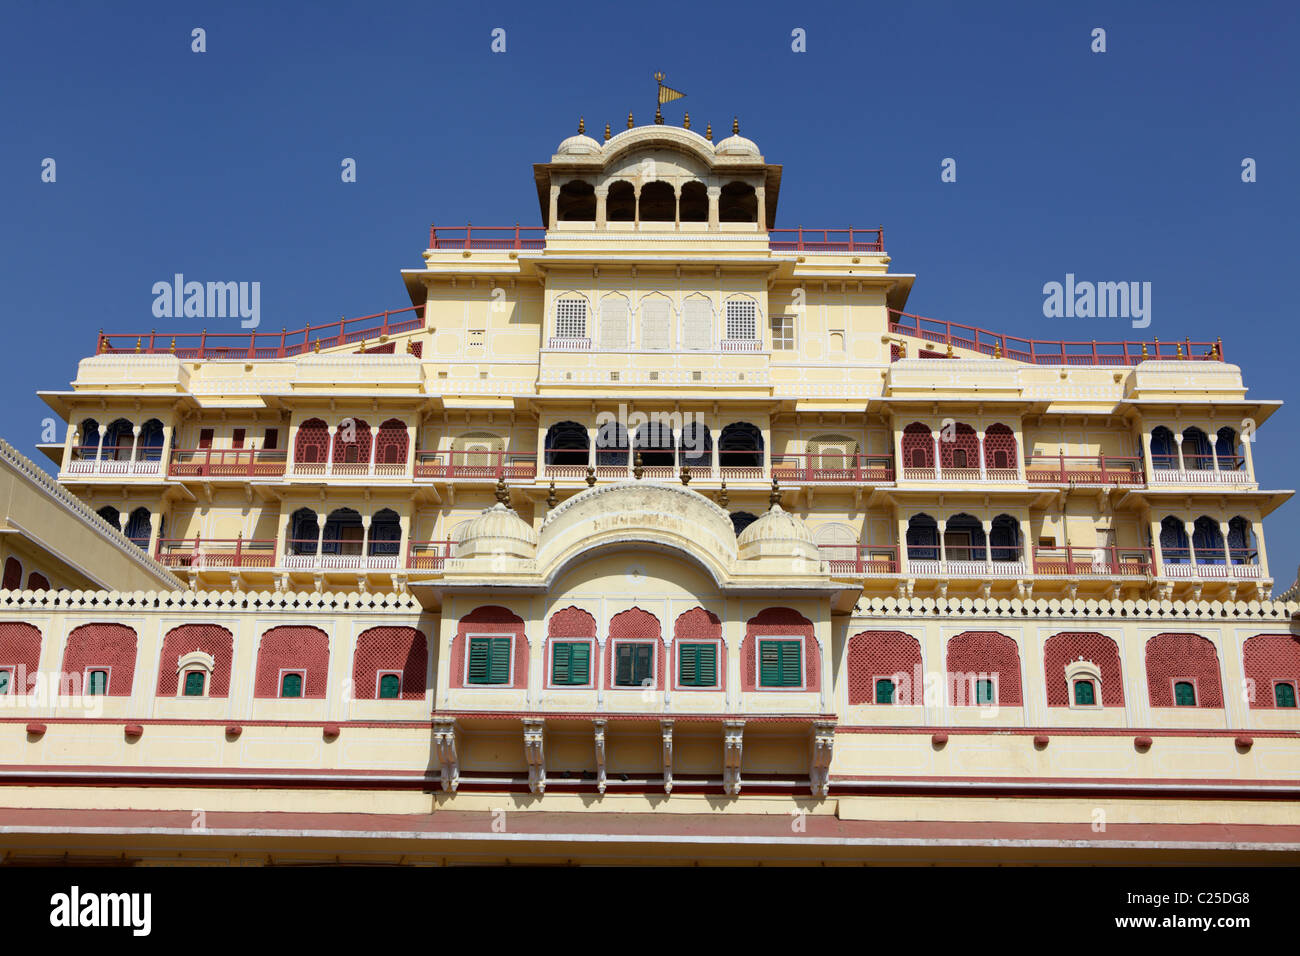 Chandra Mahal palace in Jaipur, India Stock Photo